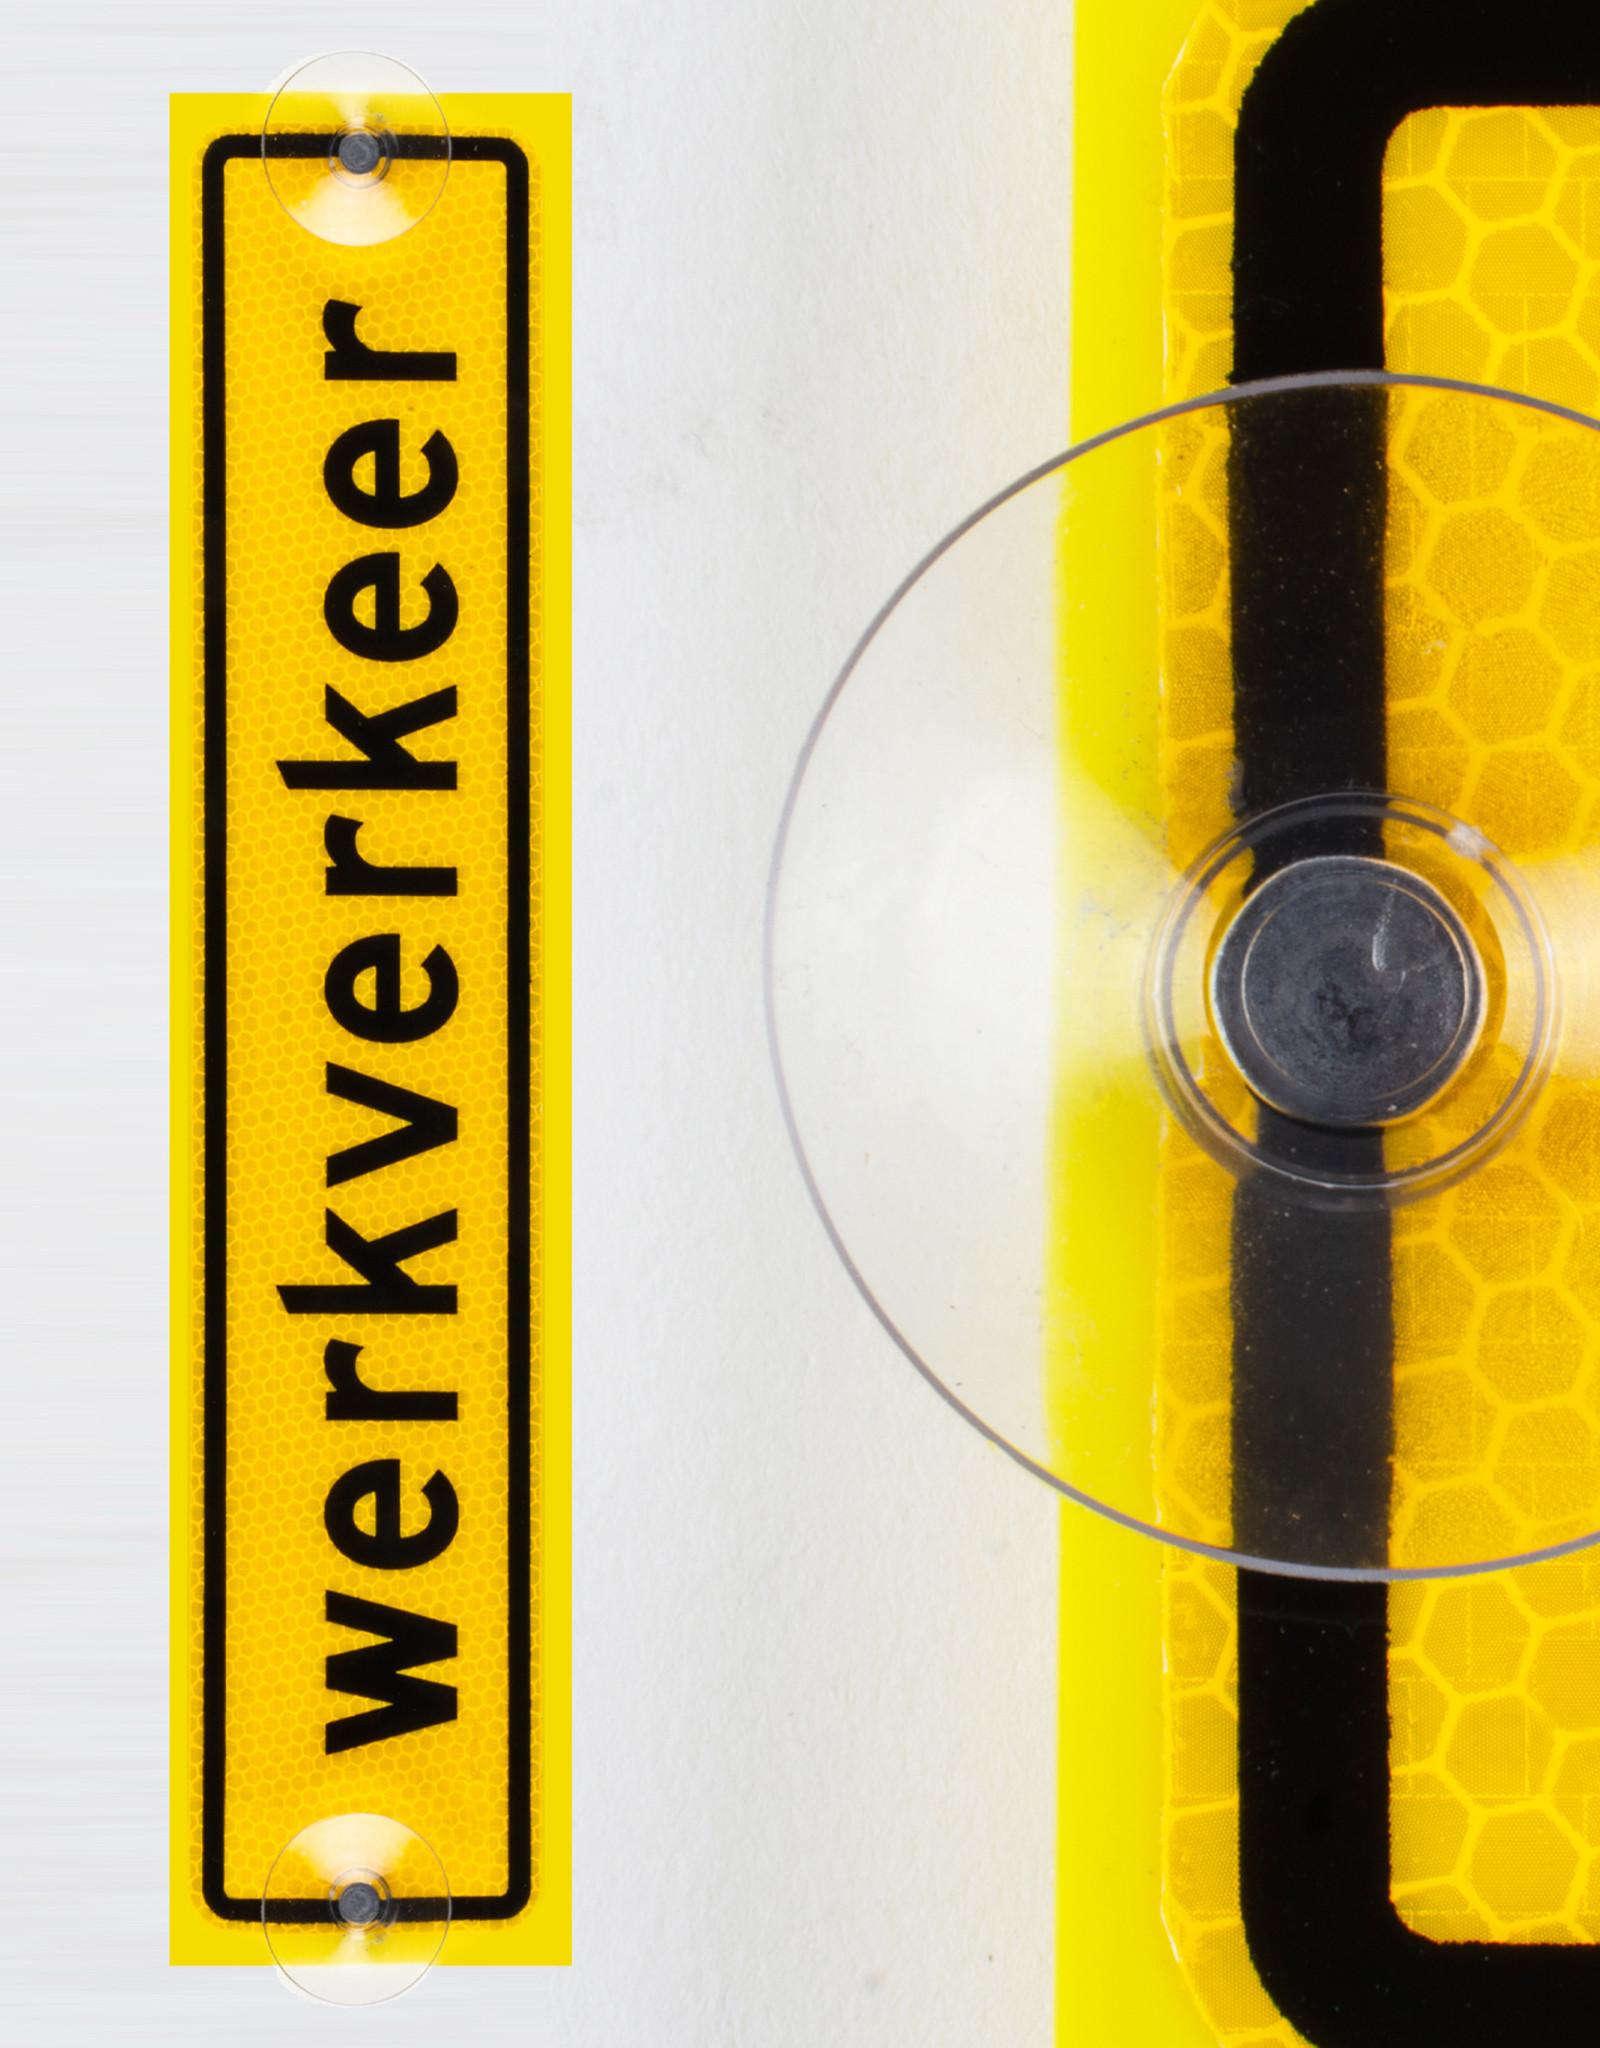 Ri-Traffic | Werkverkeer Bordje 40cm x 8cm - GEEL - Klasse 3 Folie